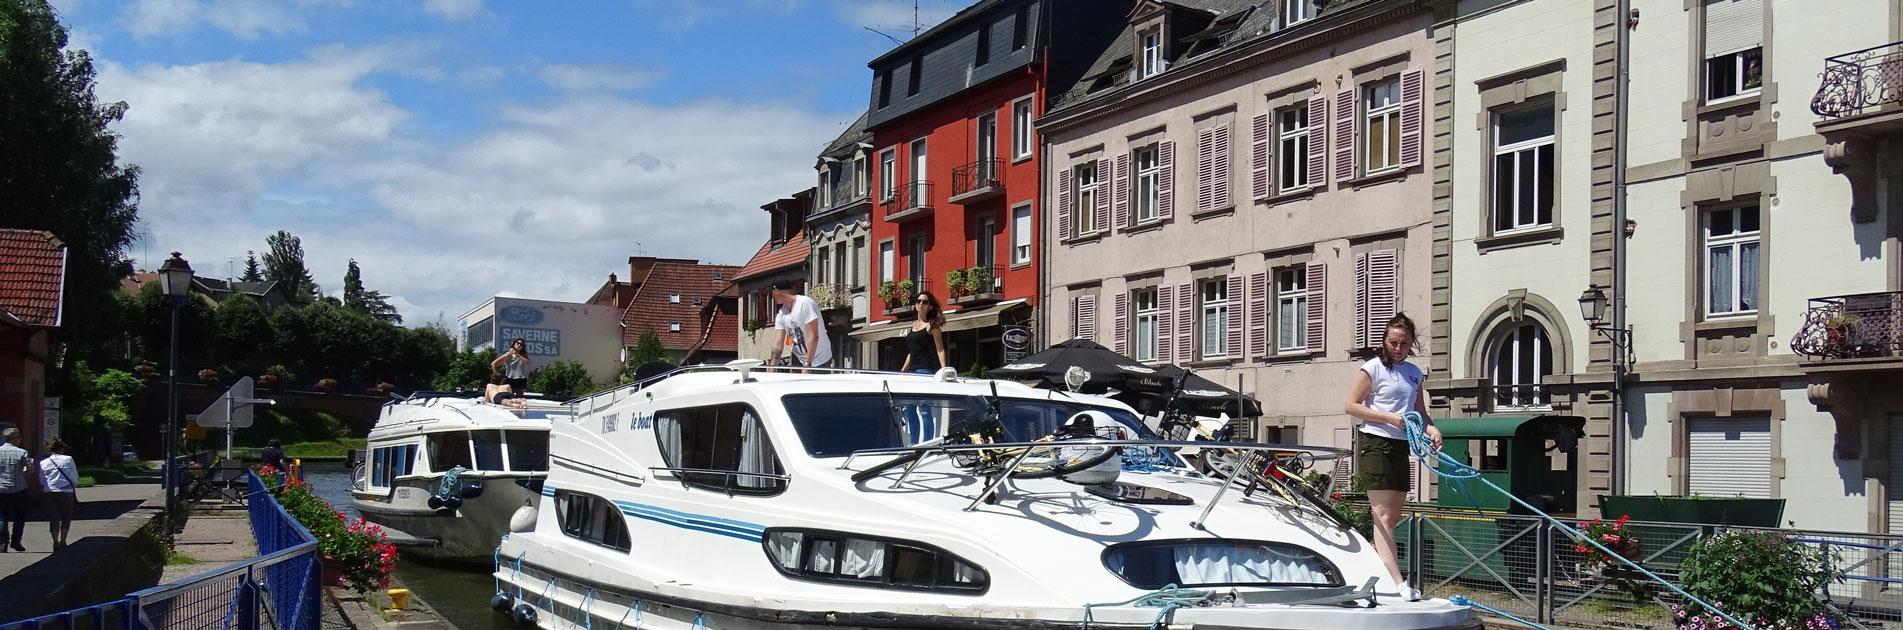 Flodbåde på kanal i Alsace